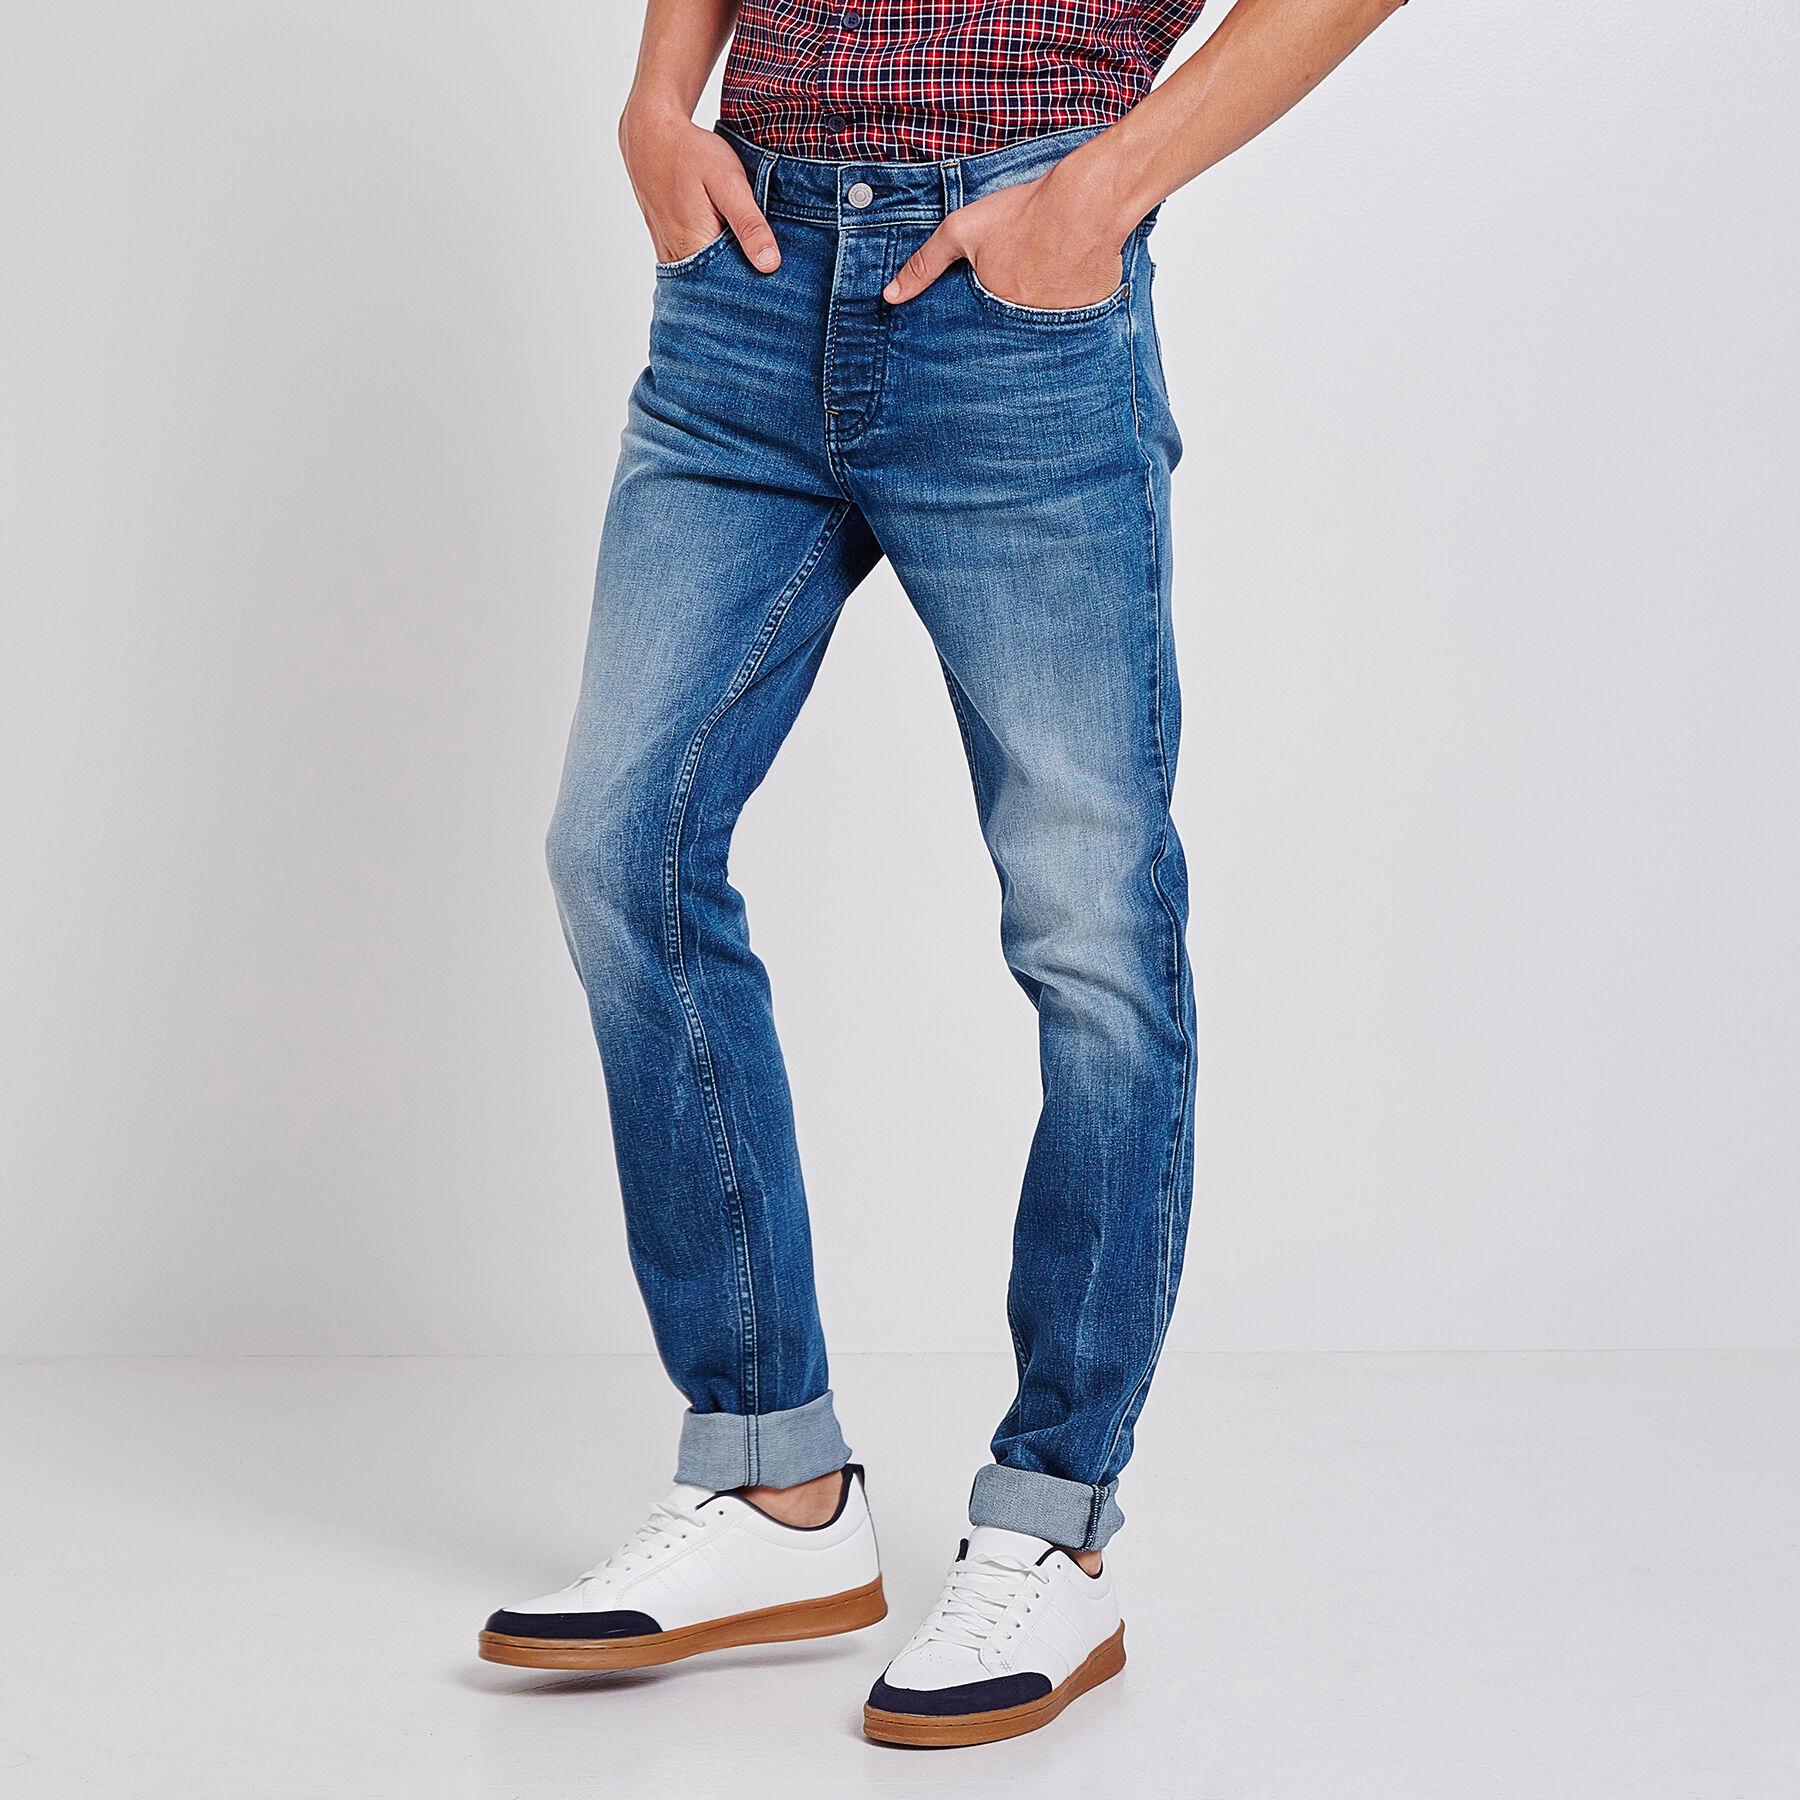 4l Slim Homme Jean Jules Greencast 0qYzw8Z